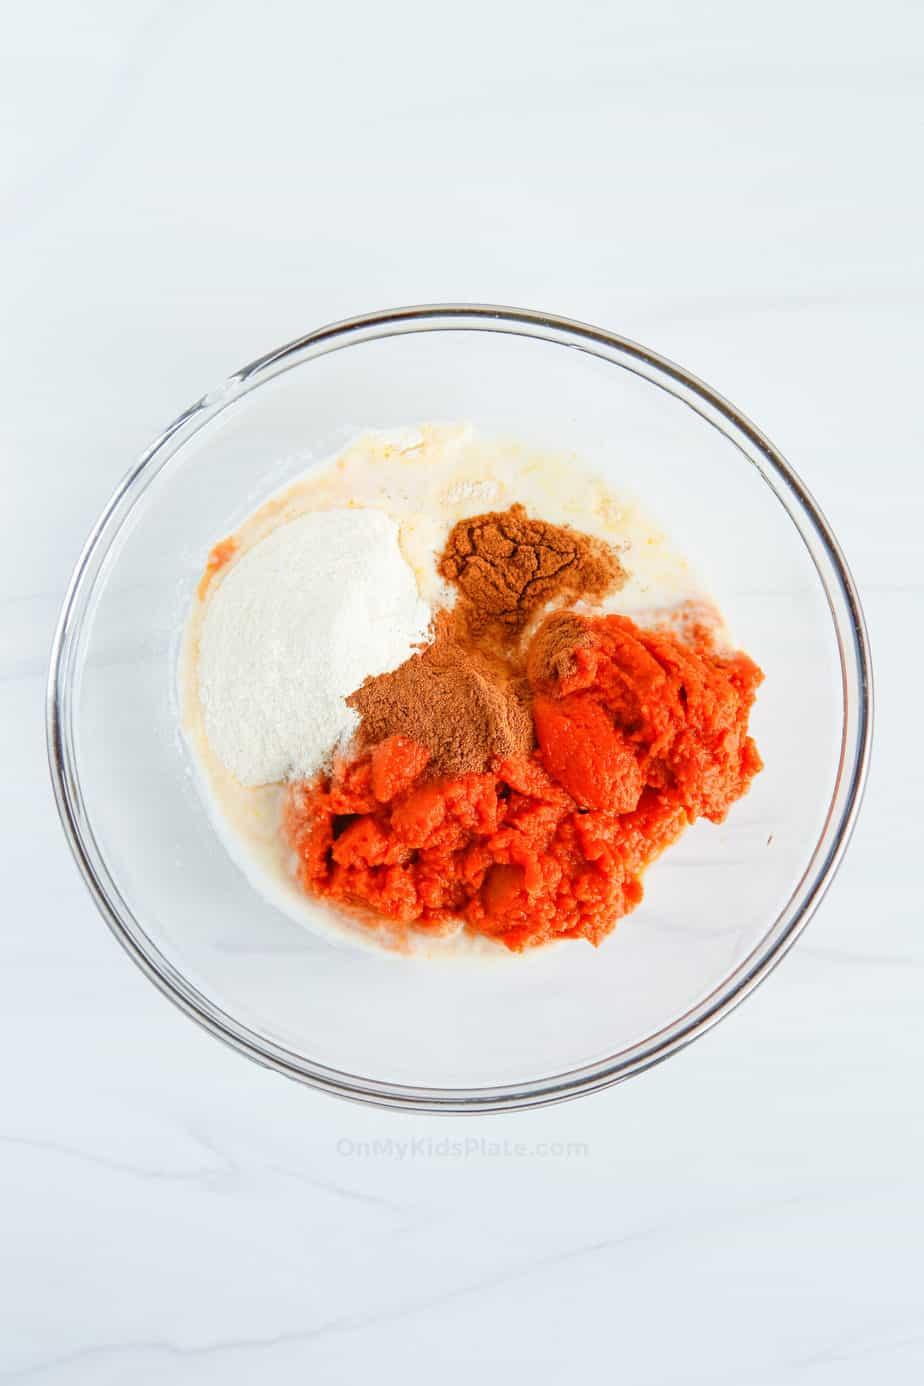 Mixing ingredients for pumpkin pie dip in a bowl